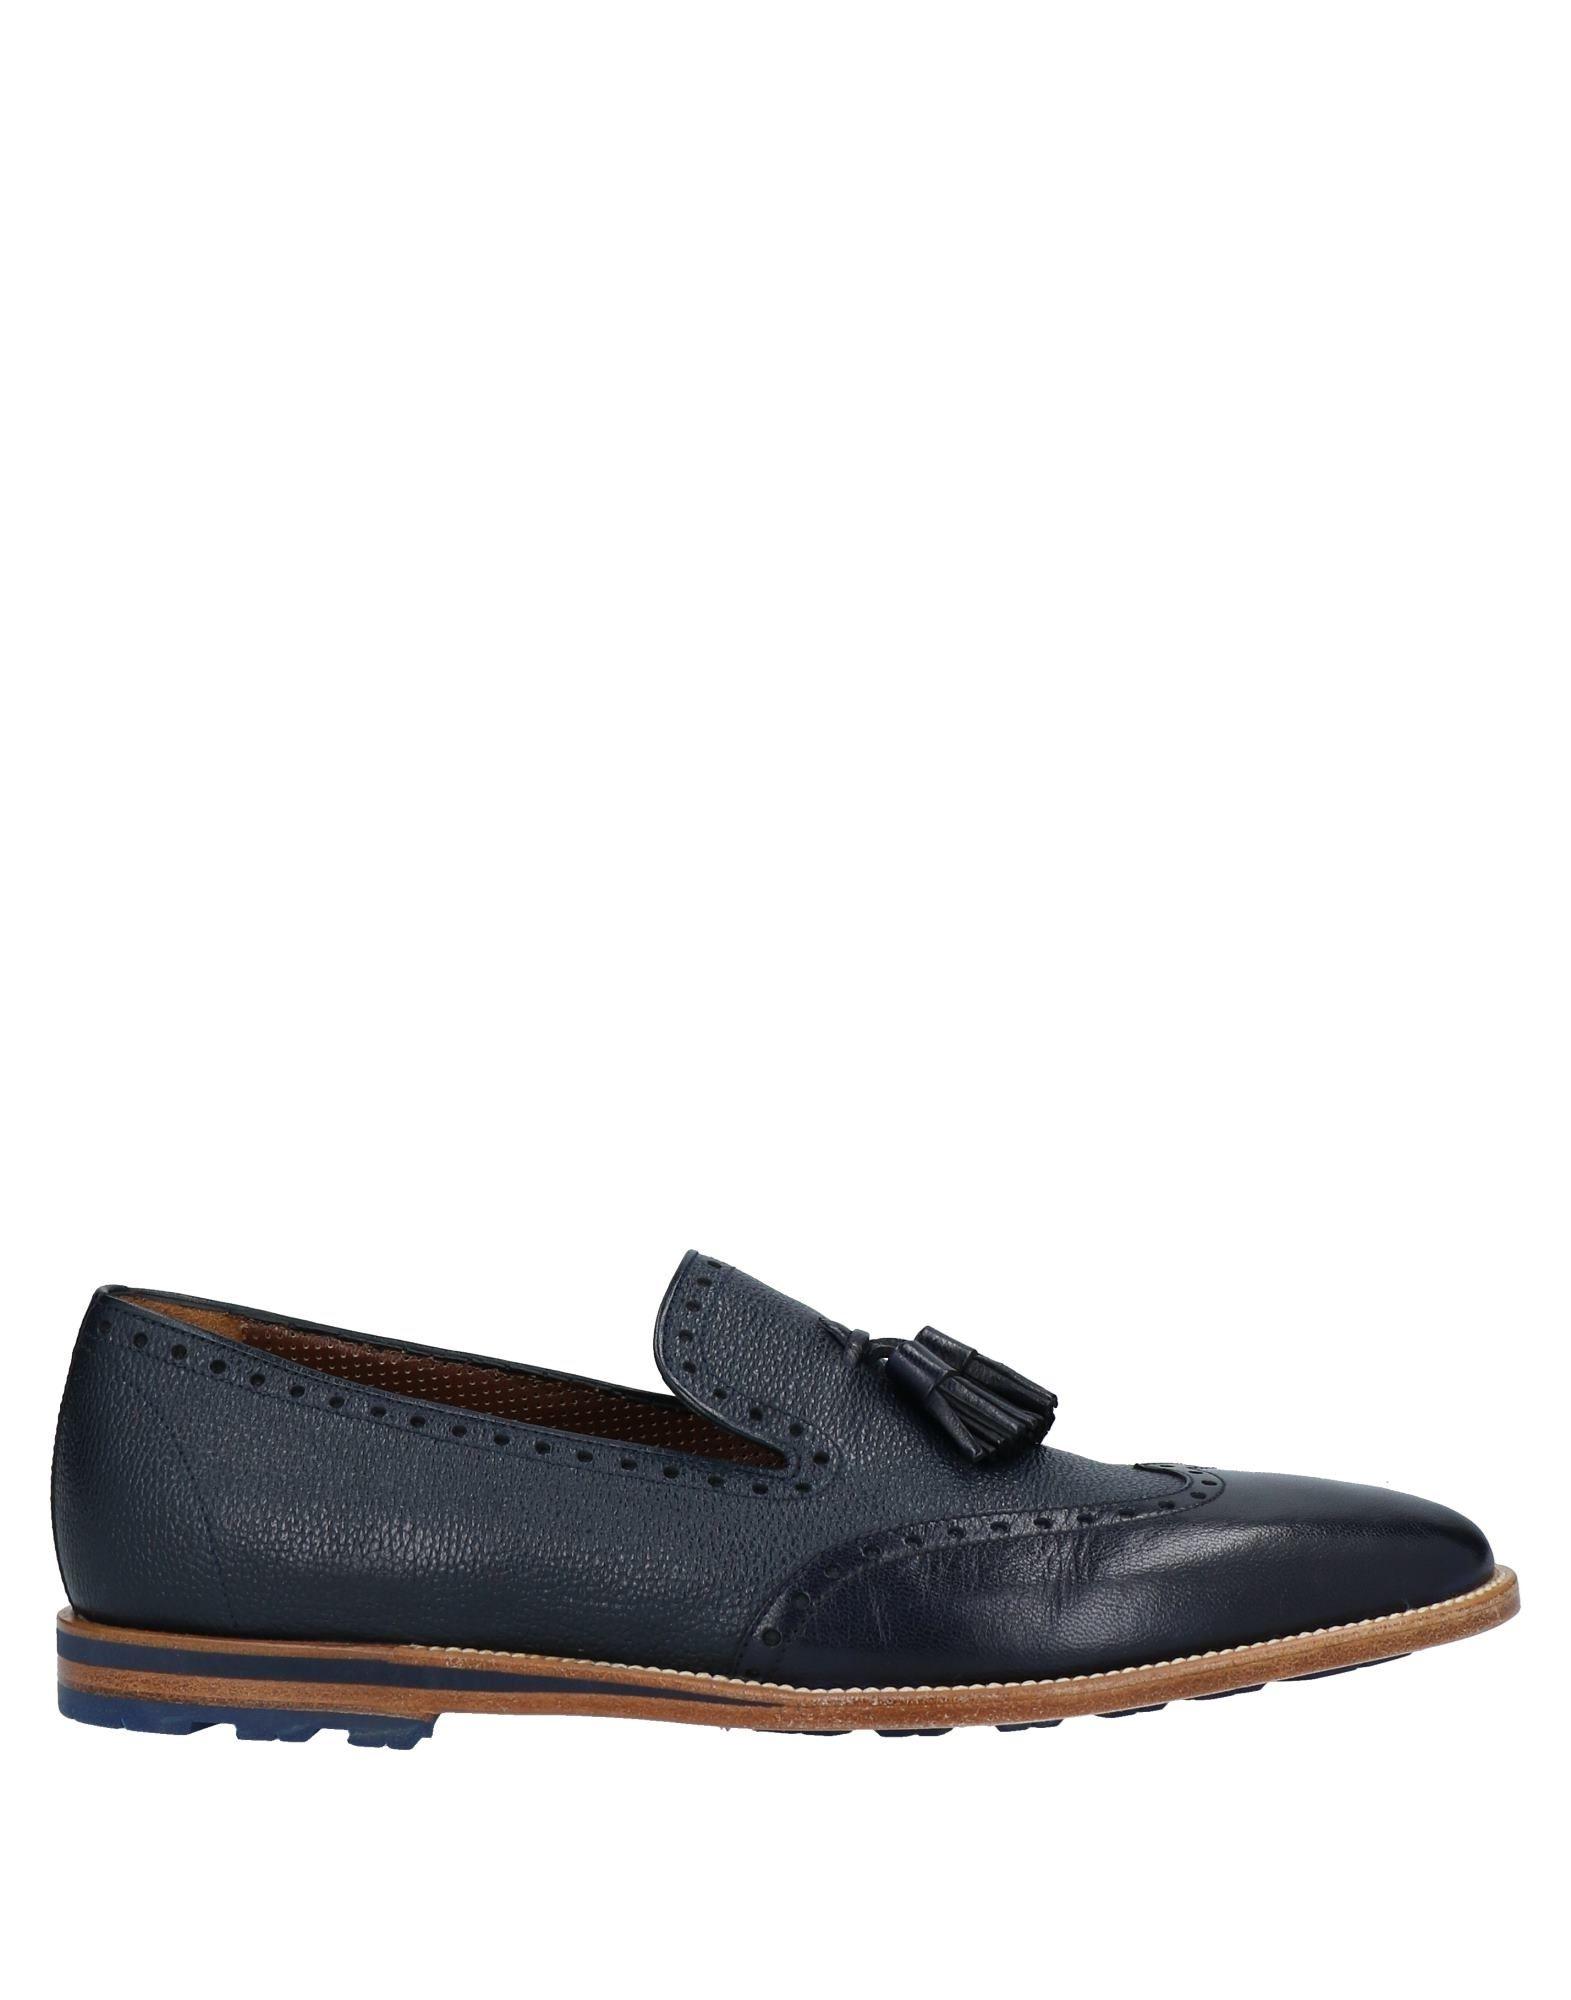 A.testoni Loafers In Dark Blue